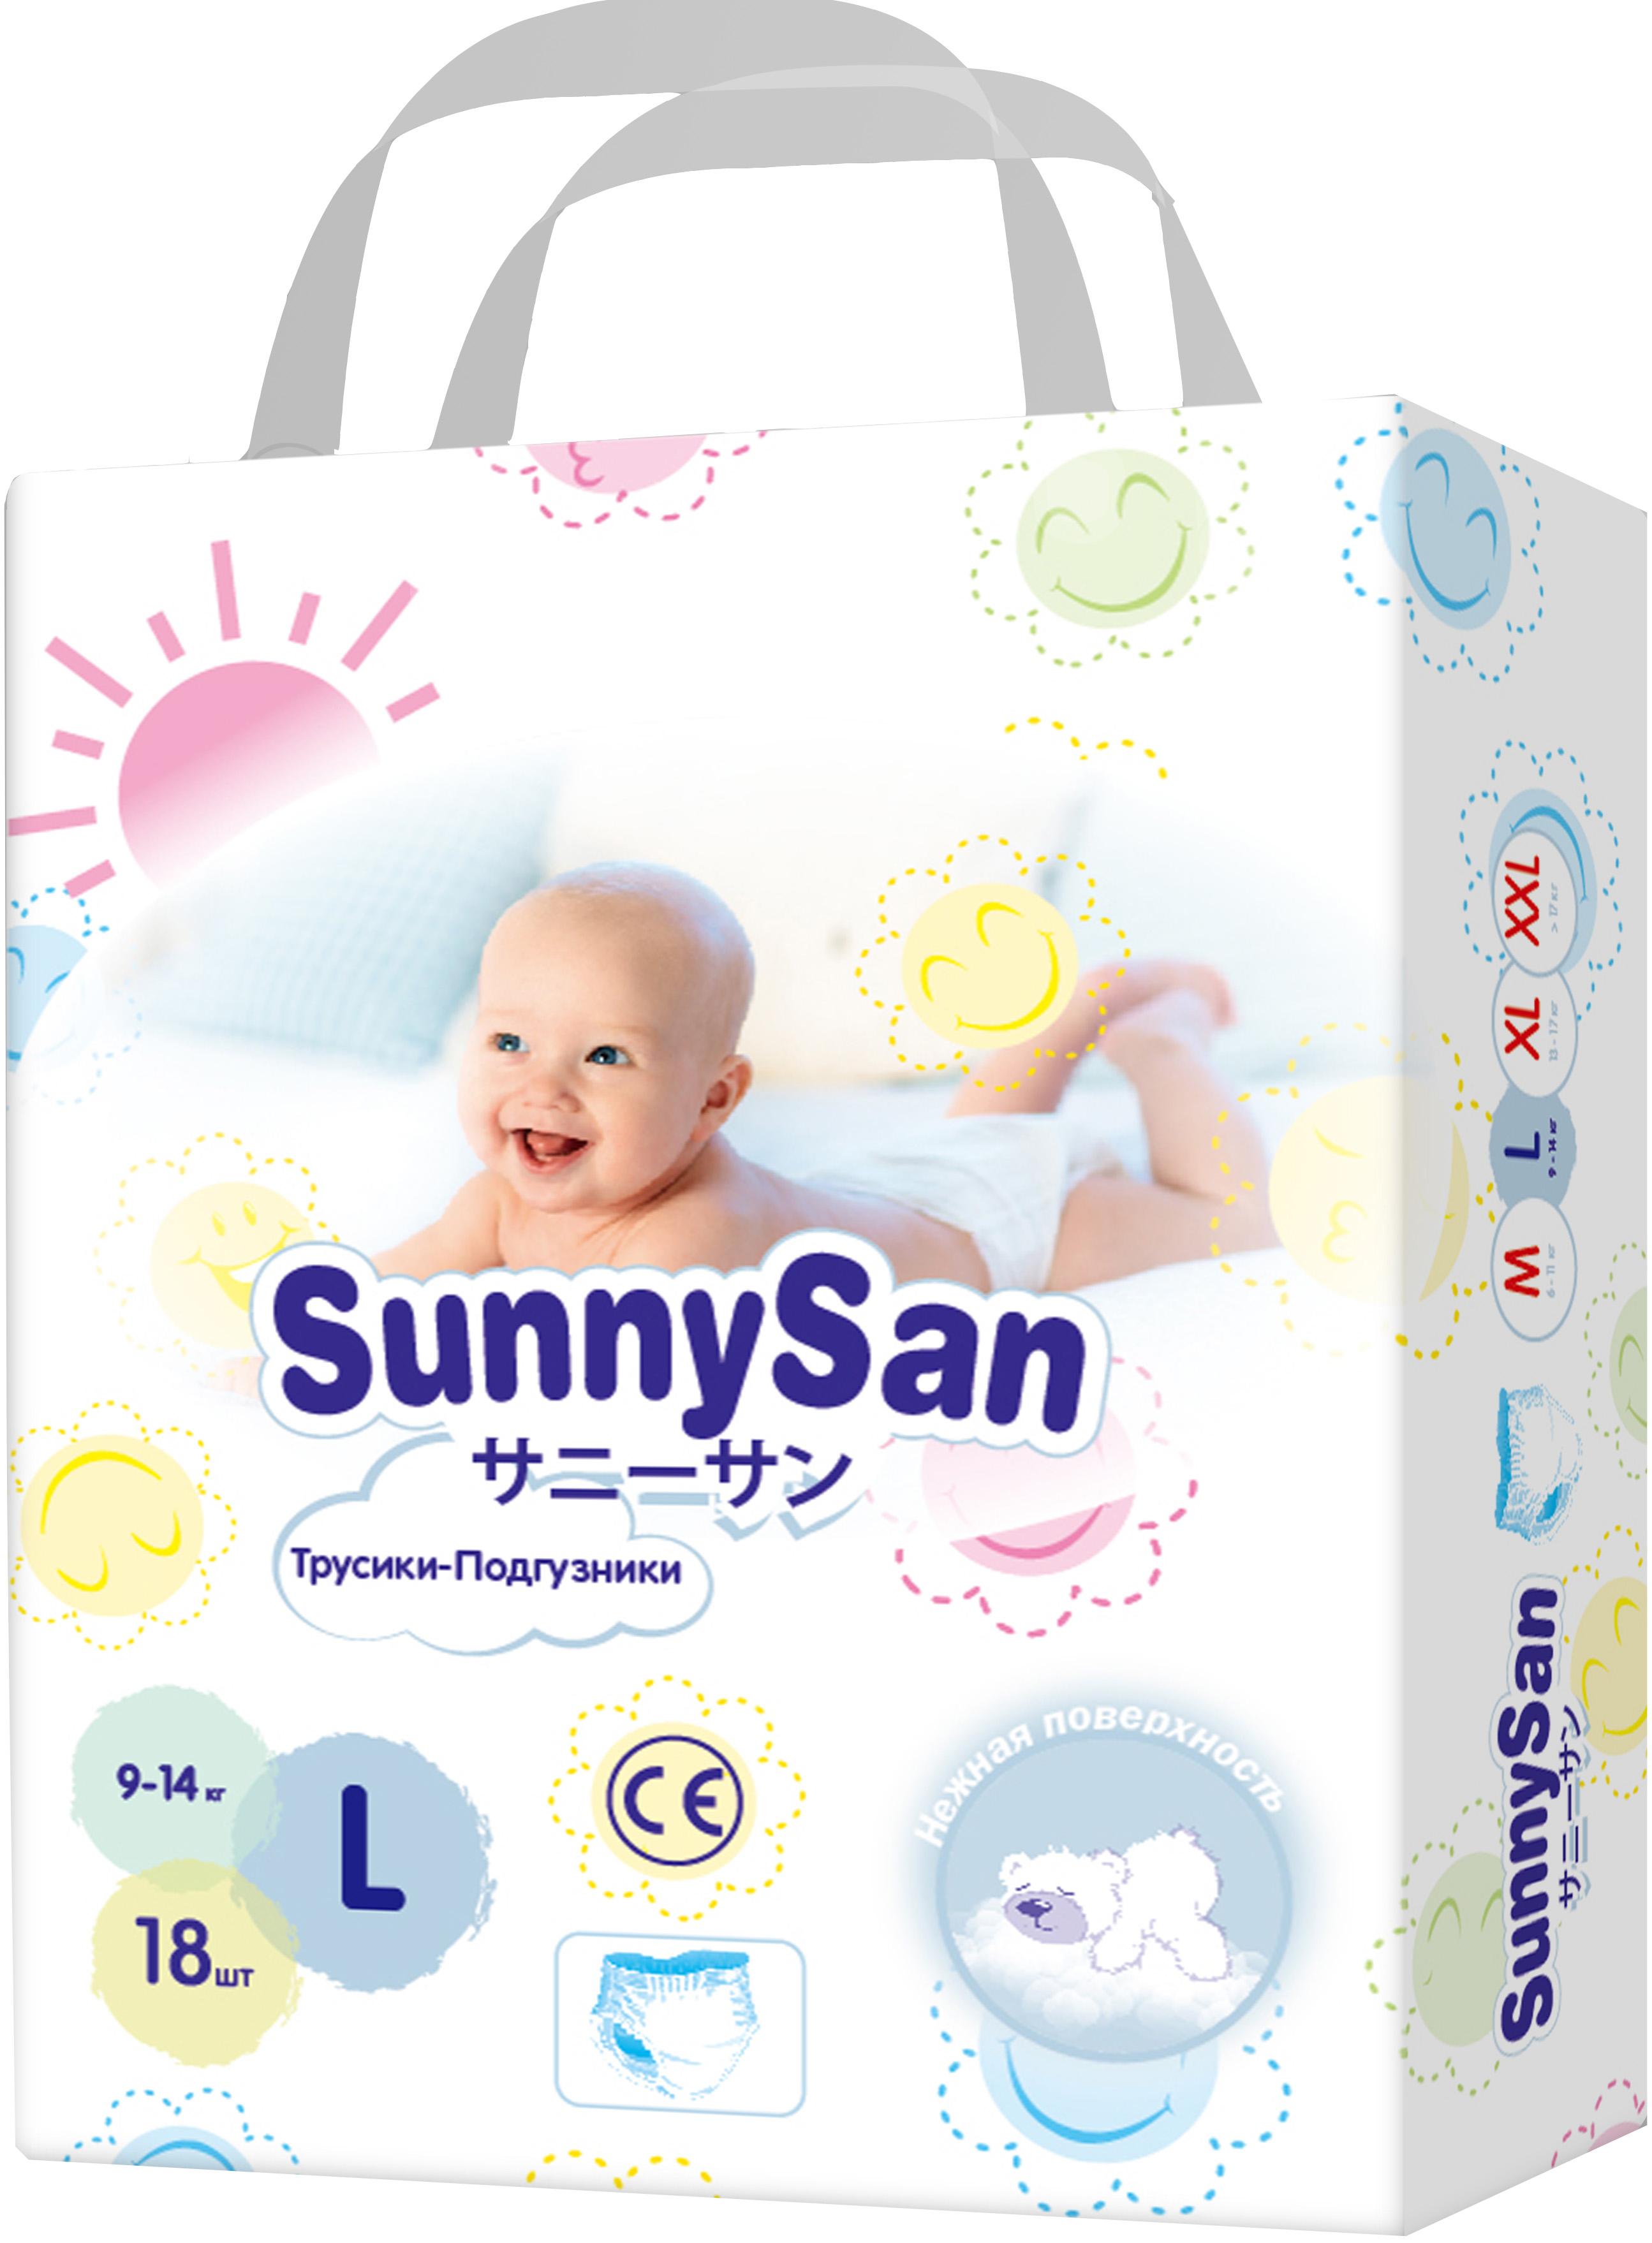 Трусики-подгузники SunnySan L (9-14 кг) 18 шт.